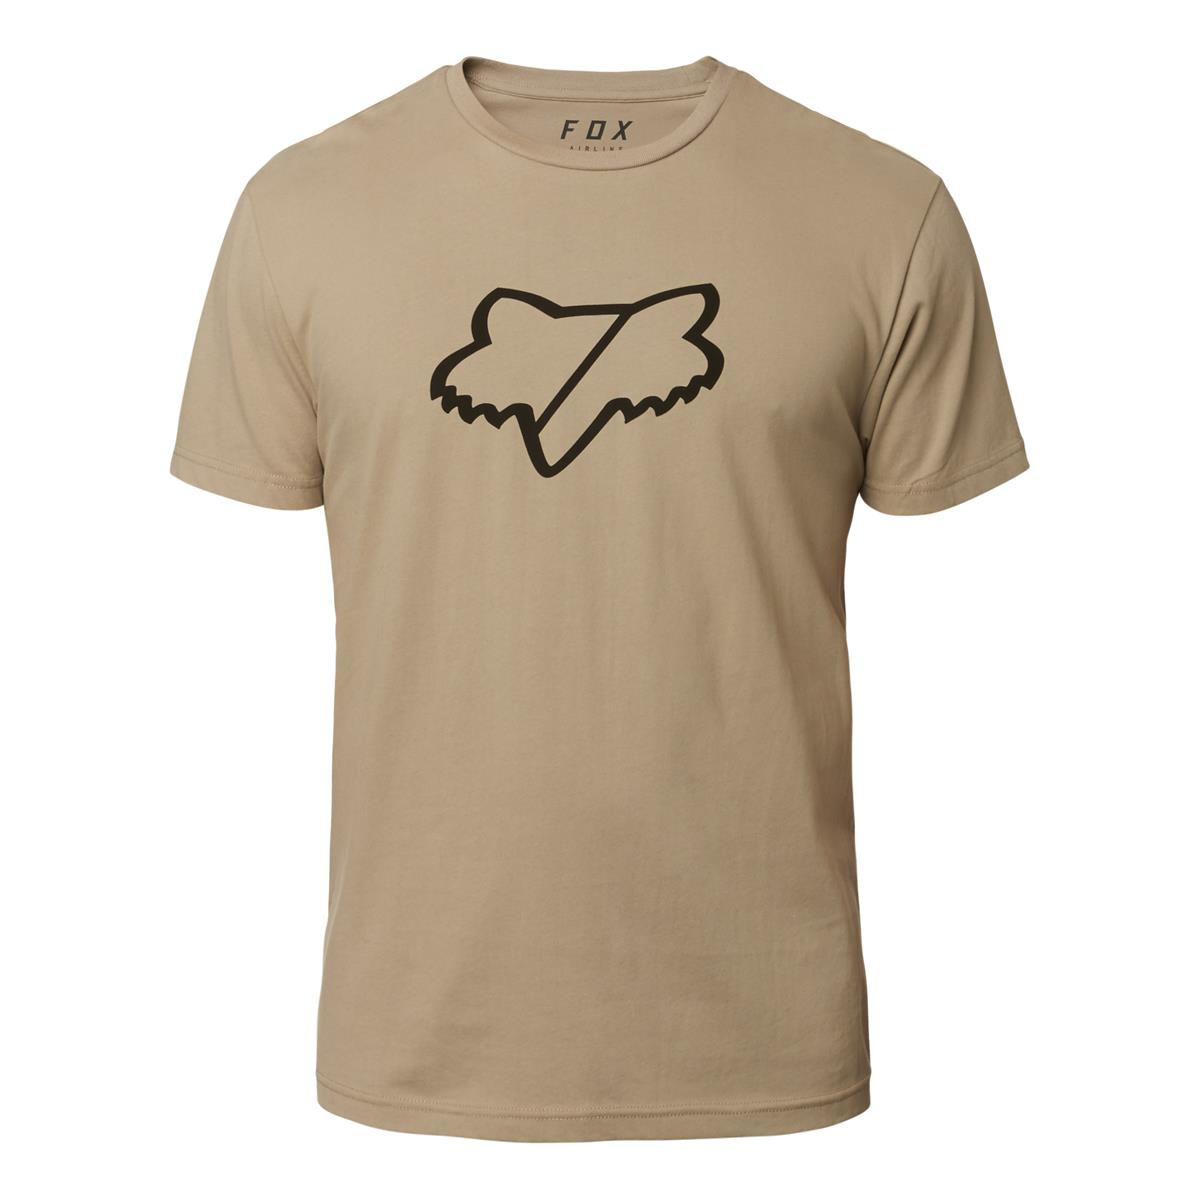 Fox T-Shirt Slash Airline Limited Edition Irmata - Sand